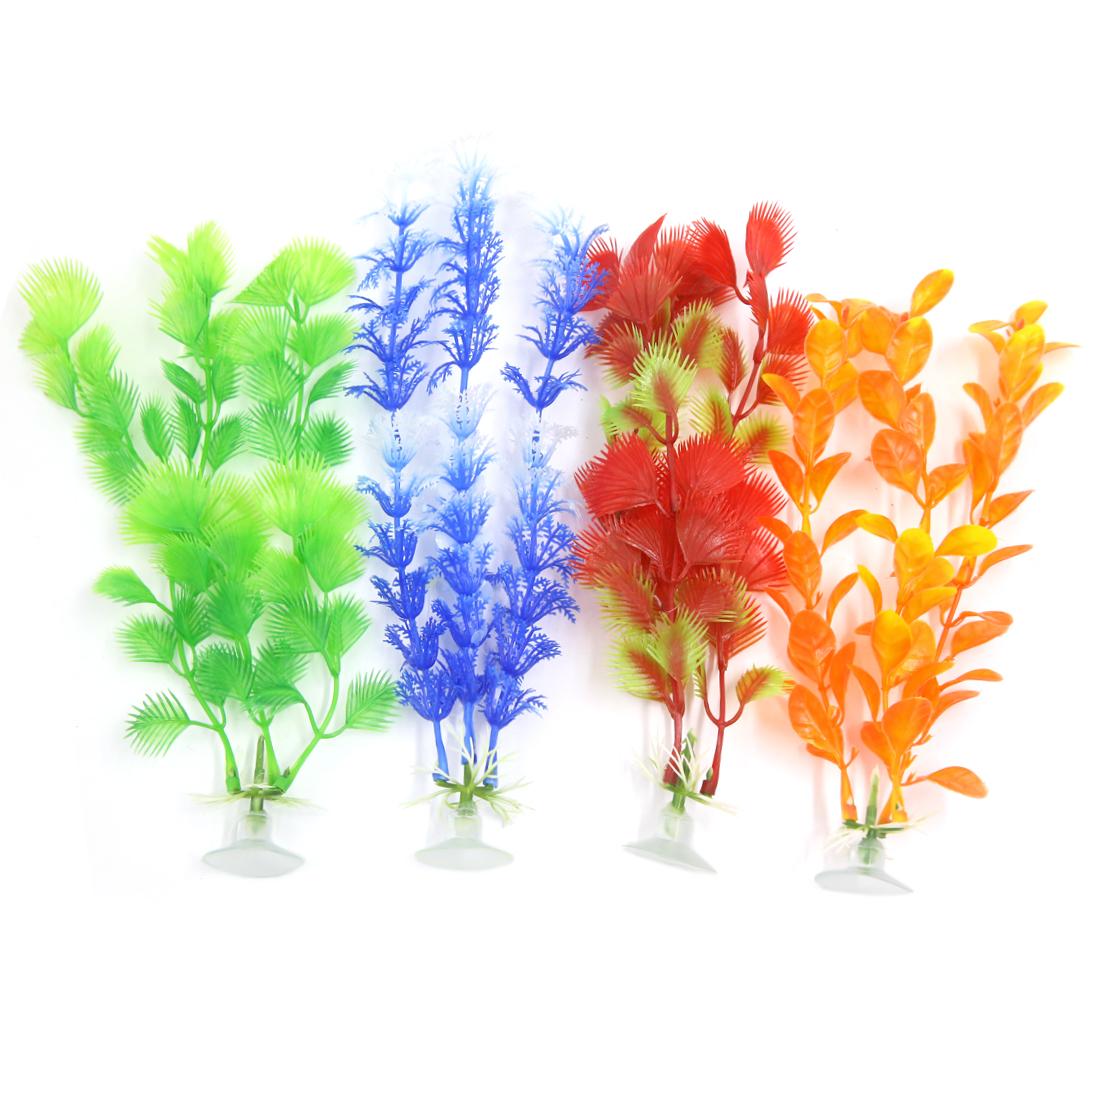 4 Pcs Fish Tank Ornament Plastic Decoration Plant With Suction Cup